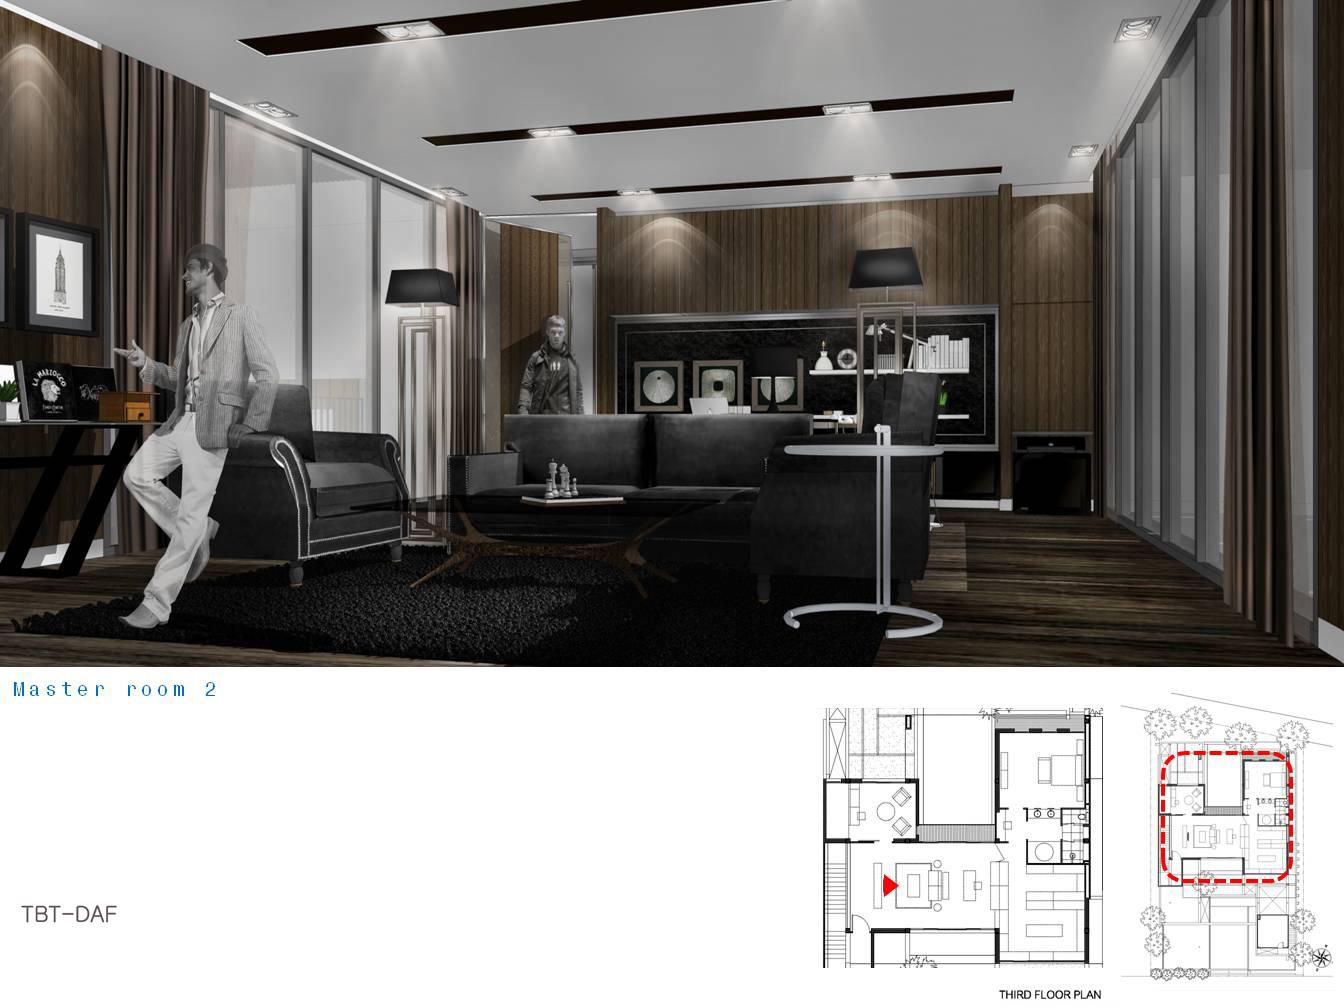 TBT-DAF interior design house robinson 24